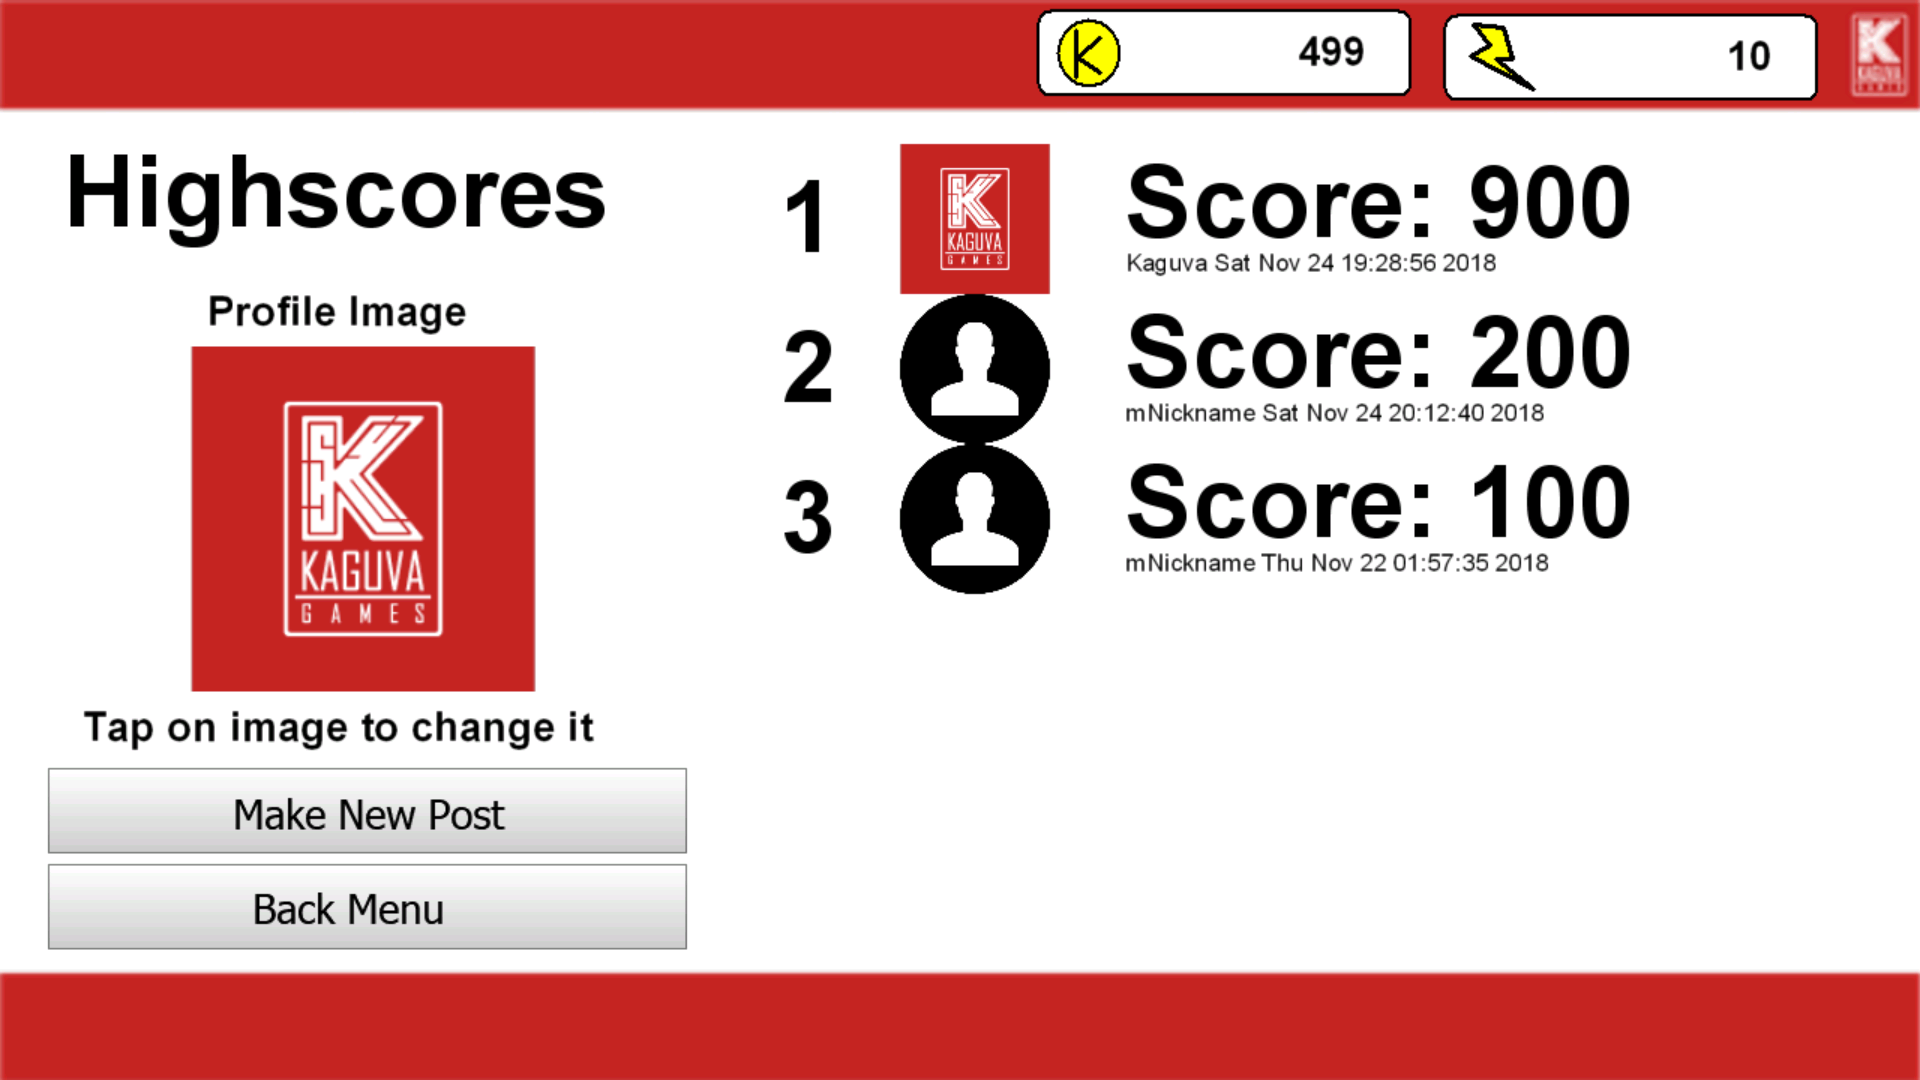 Firebase iOS,Android&Web by Kaguva   GameMaker: Marketplace